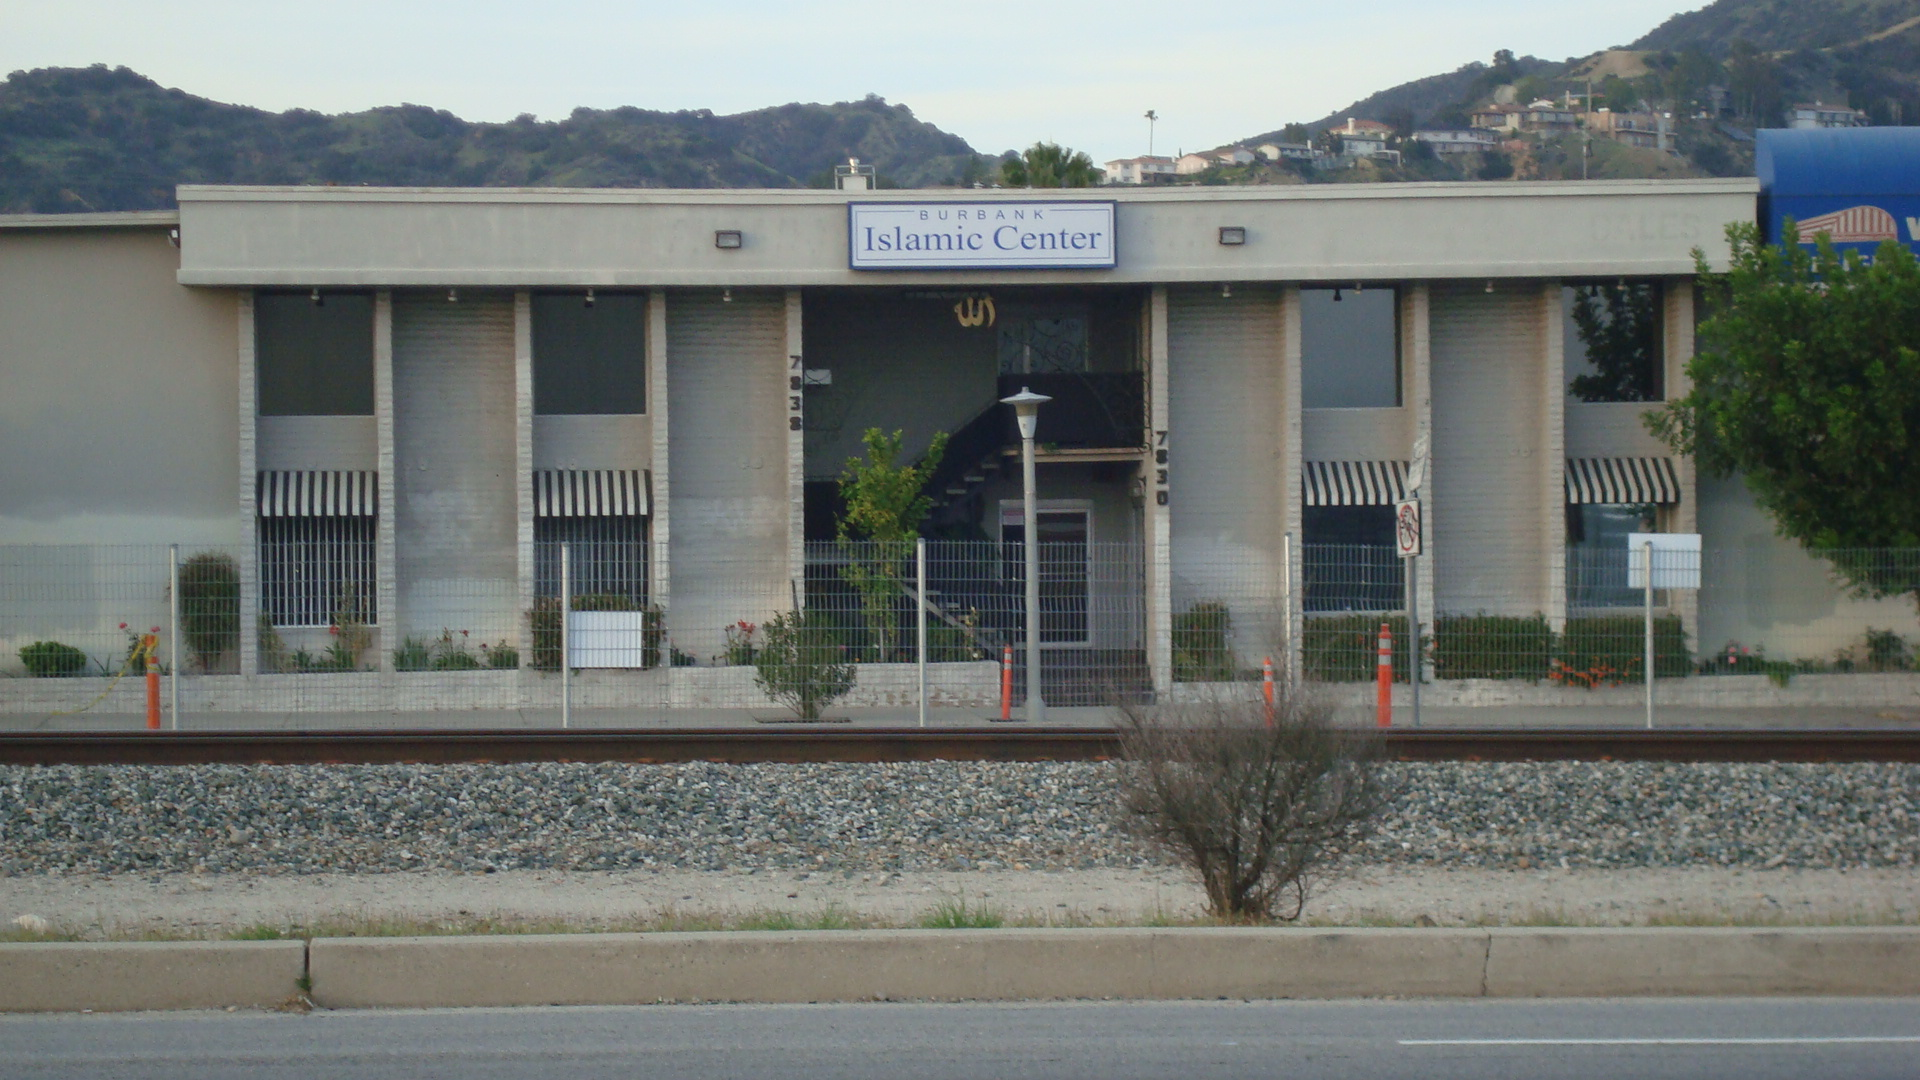 Burbank Recycling Center >> San Fernando Road The Horizon And The Skyline